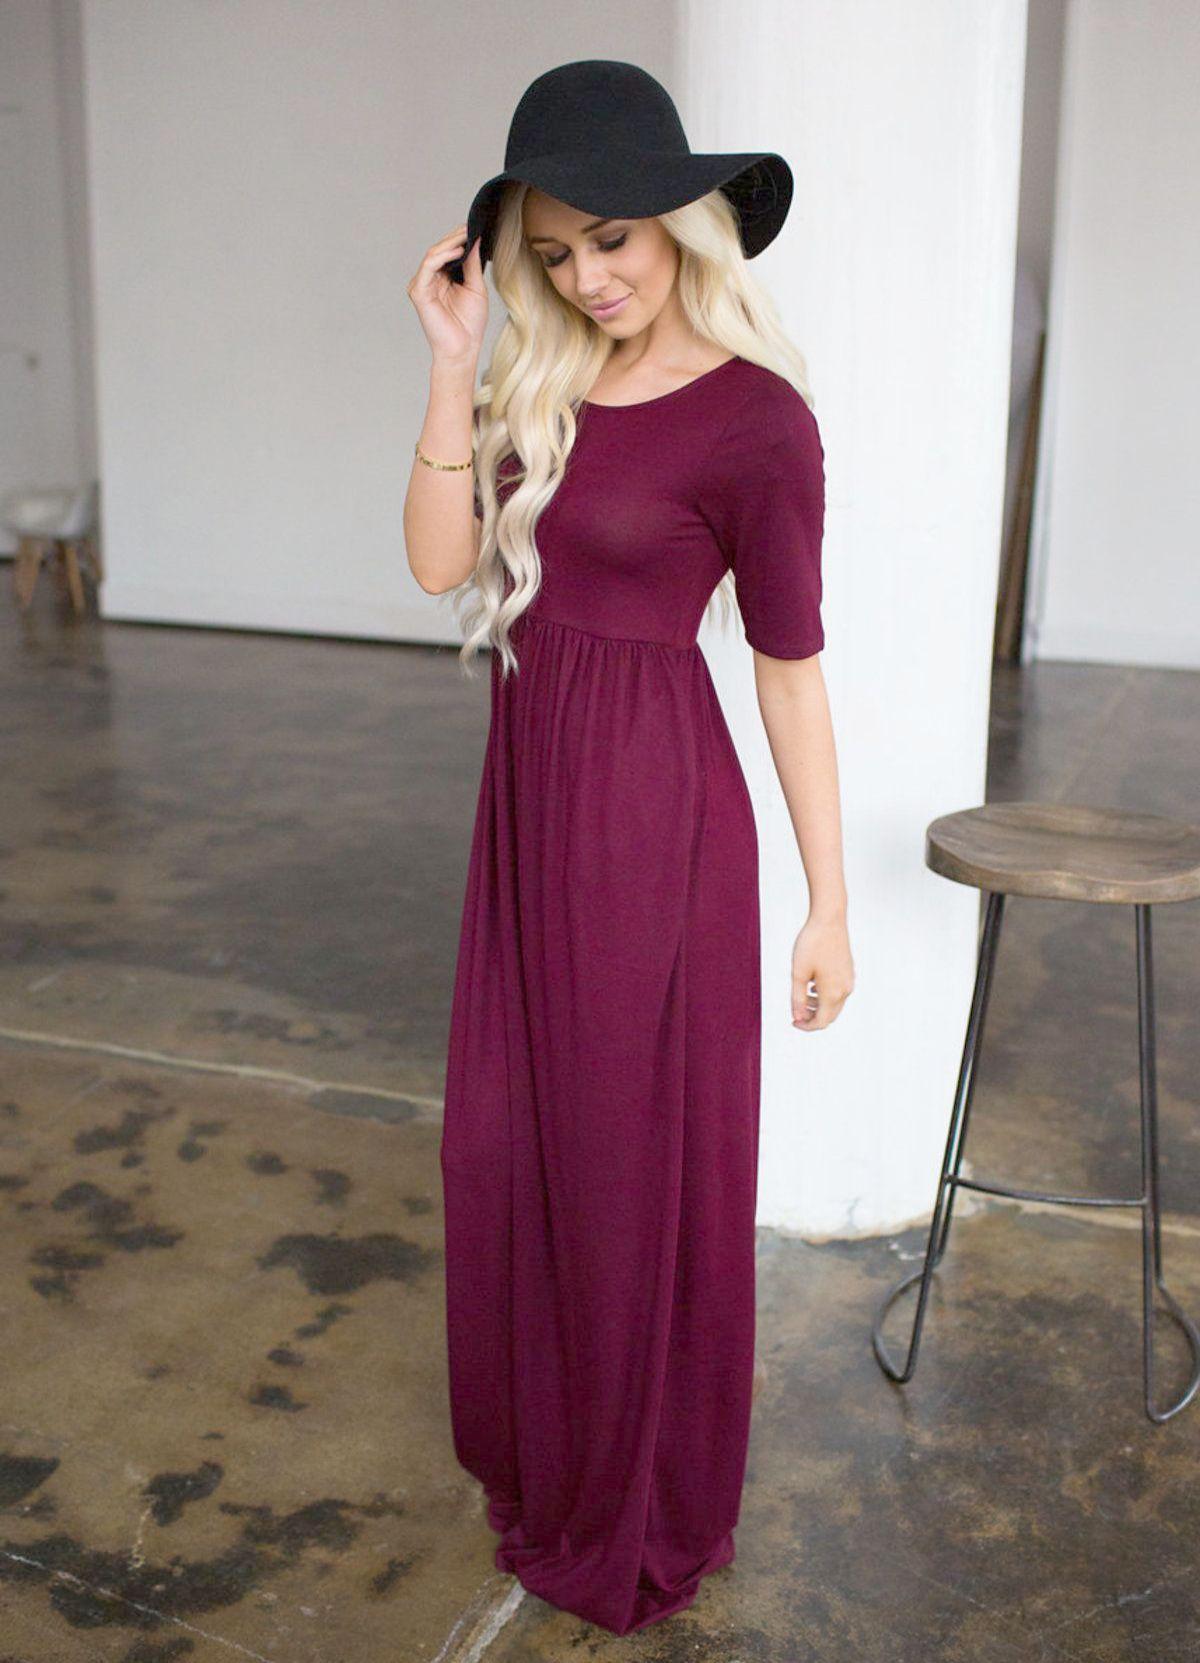 Dress Up Games For Those Who Love Fashion Via Dress Fashion Rental Our Fashion Nova Kiko D Maxi Dresses Fall Short Sleeve Prom Dresses Long Sleeve Dresses Fall [ 1663 x 1200 Pixel ]